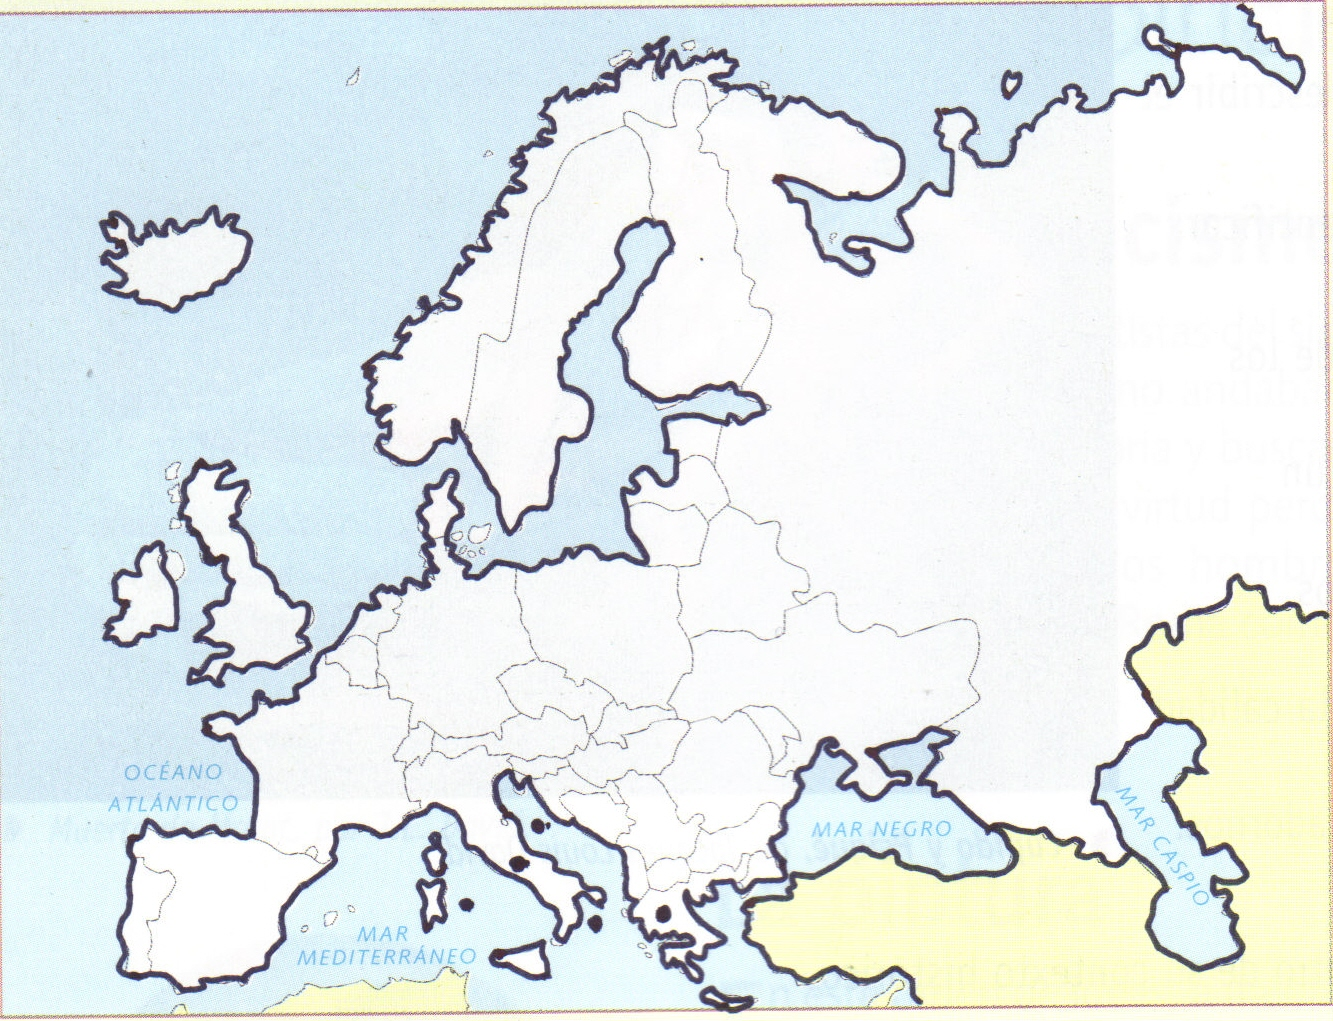 Croquis del mapa de europa - Imagui